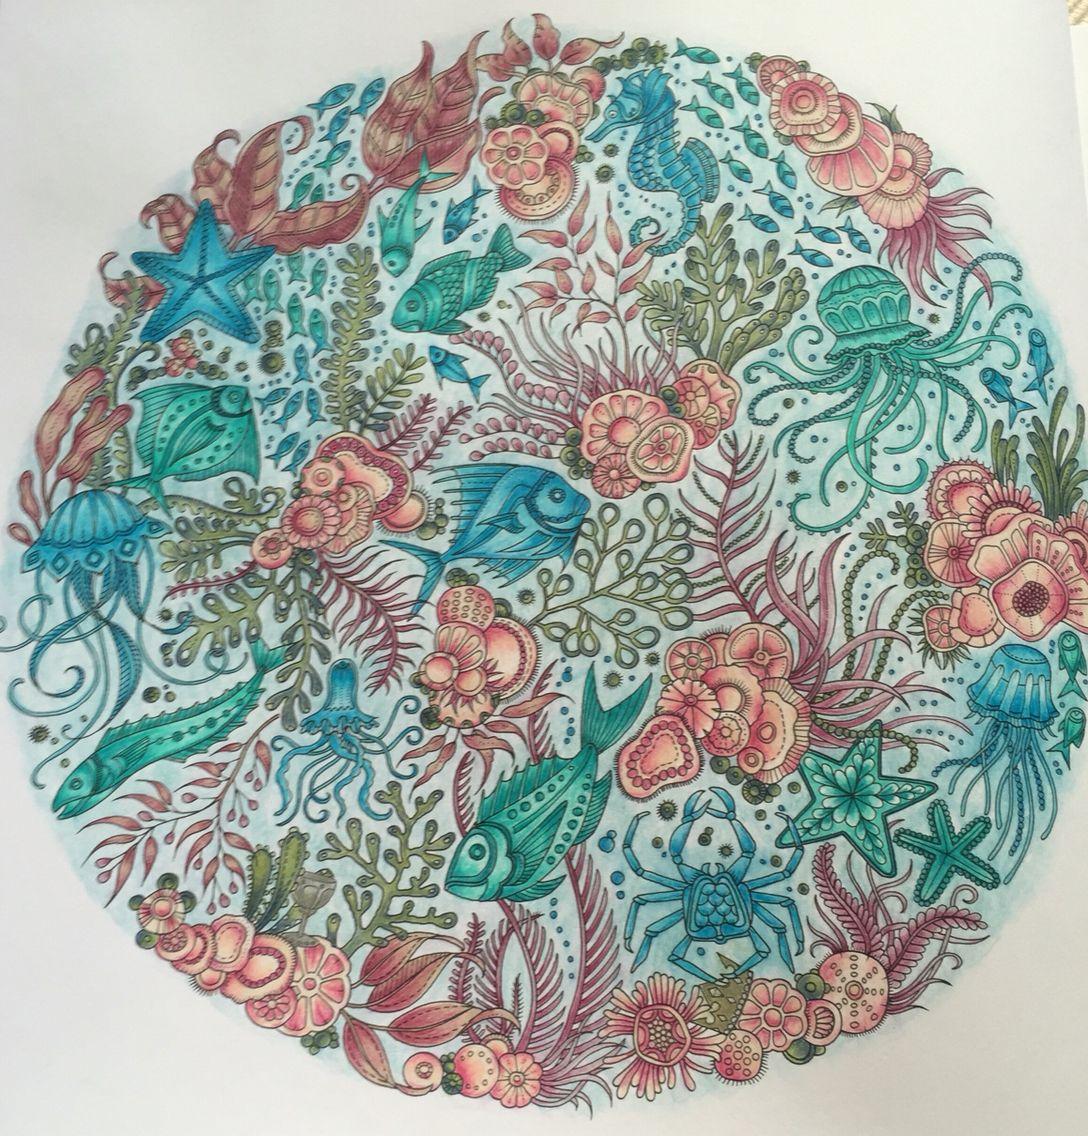 Lost Ocean, Johanna Basford, coloured in Crayola pencils, sweet ...